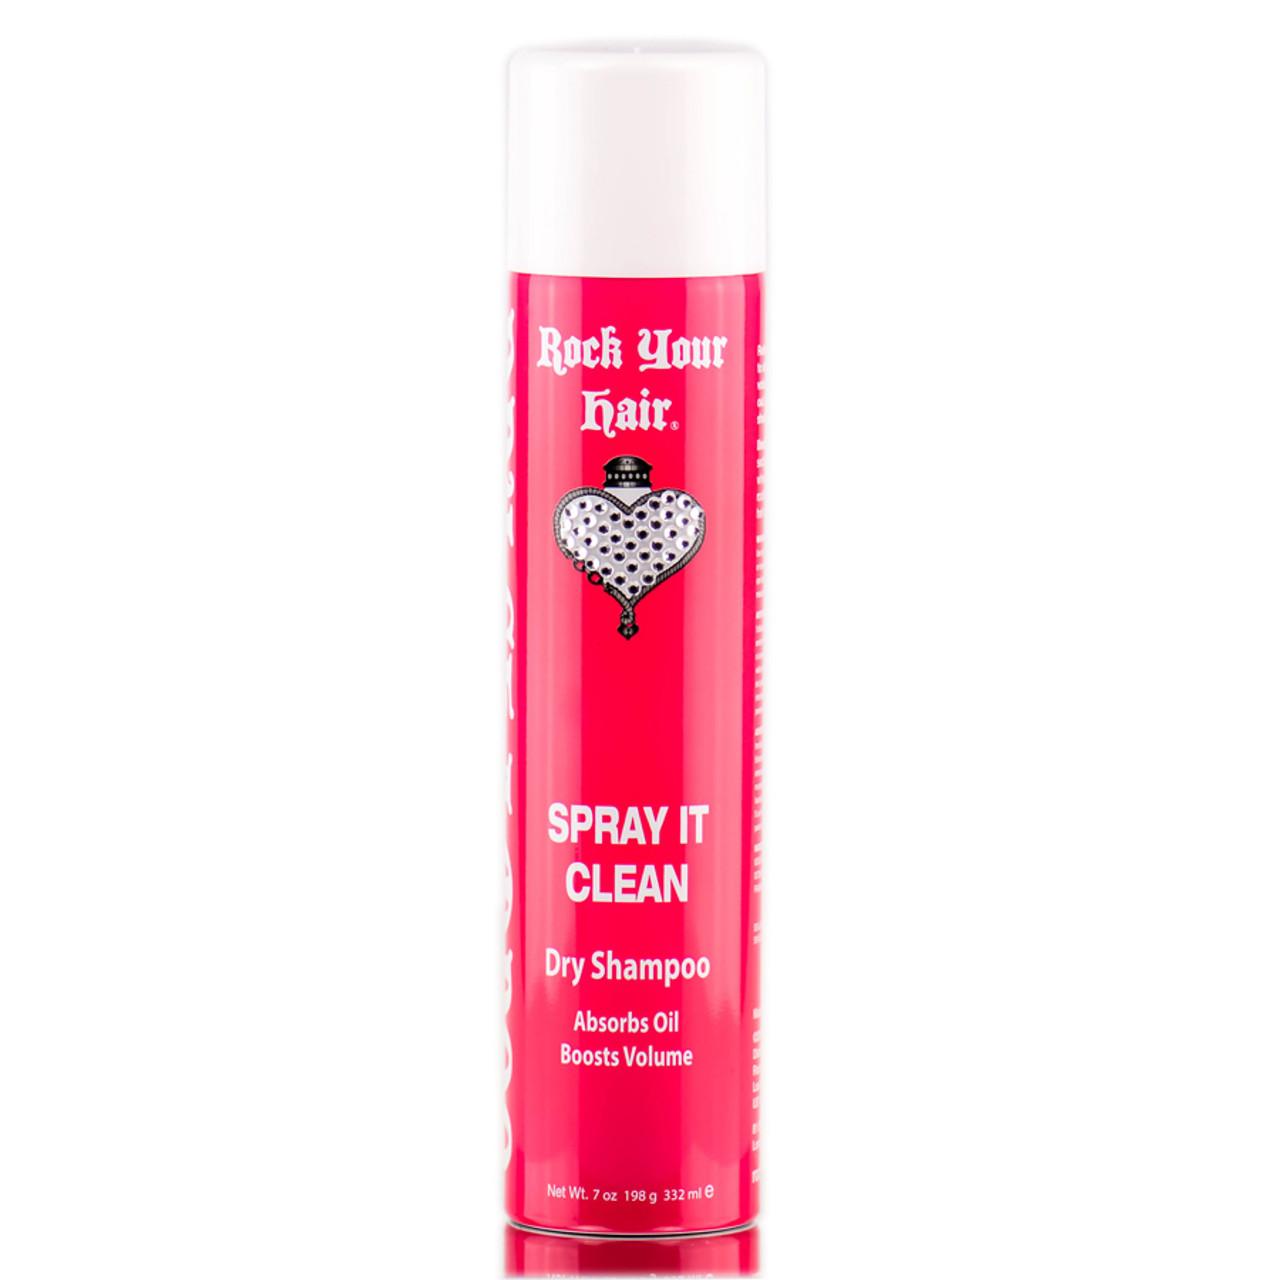 Michael O'Rourke Rock Your Hair Spray It Clean Dry Shampoo